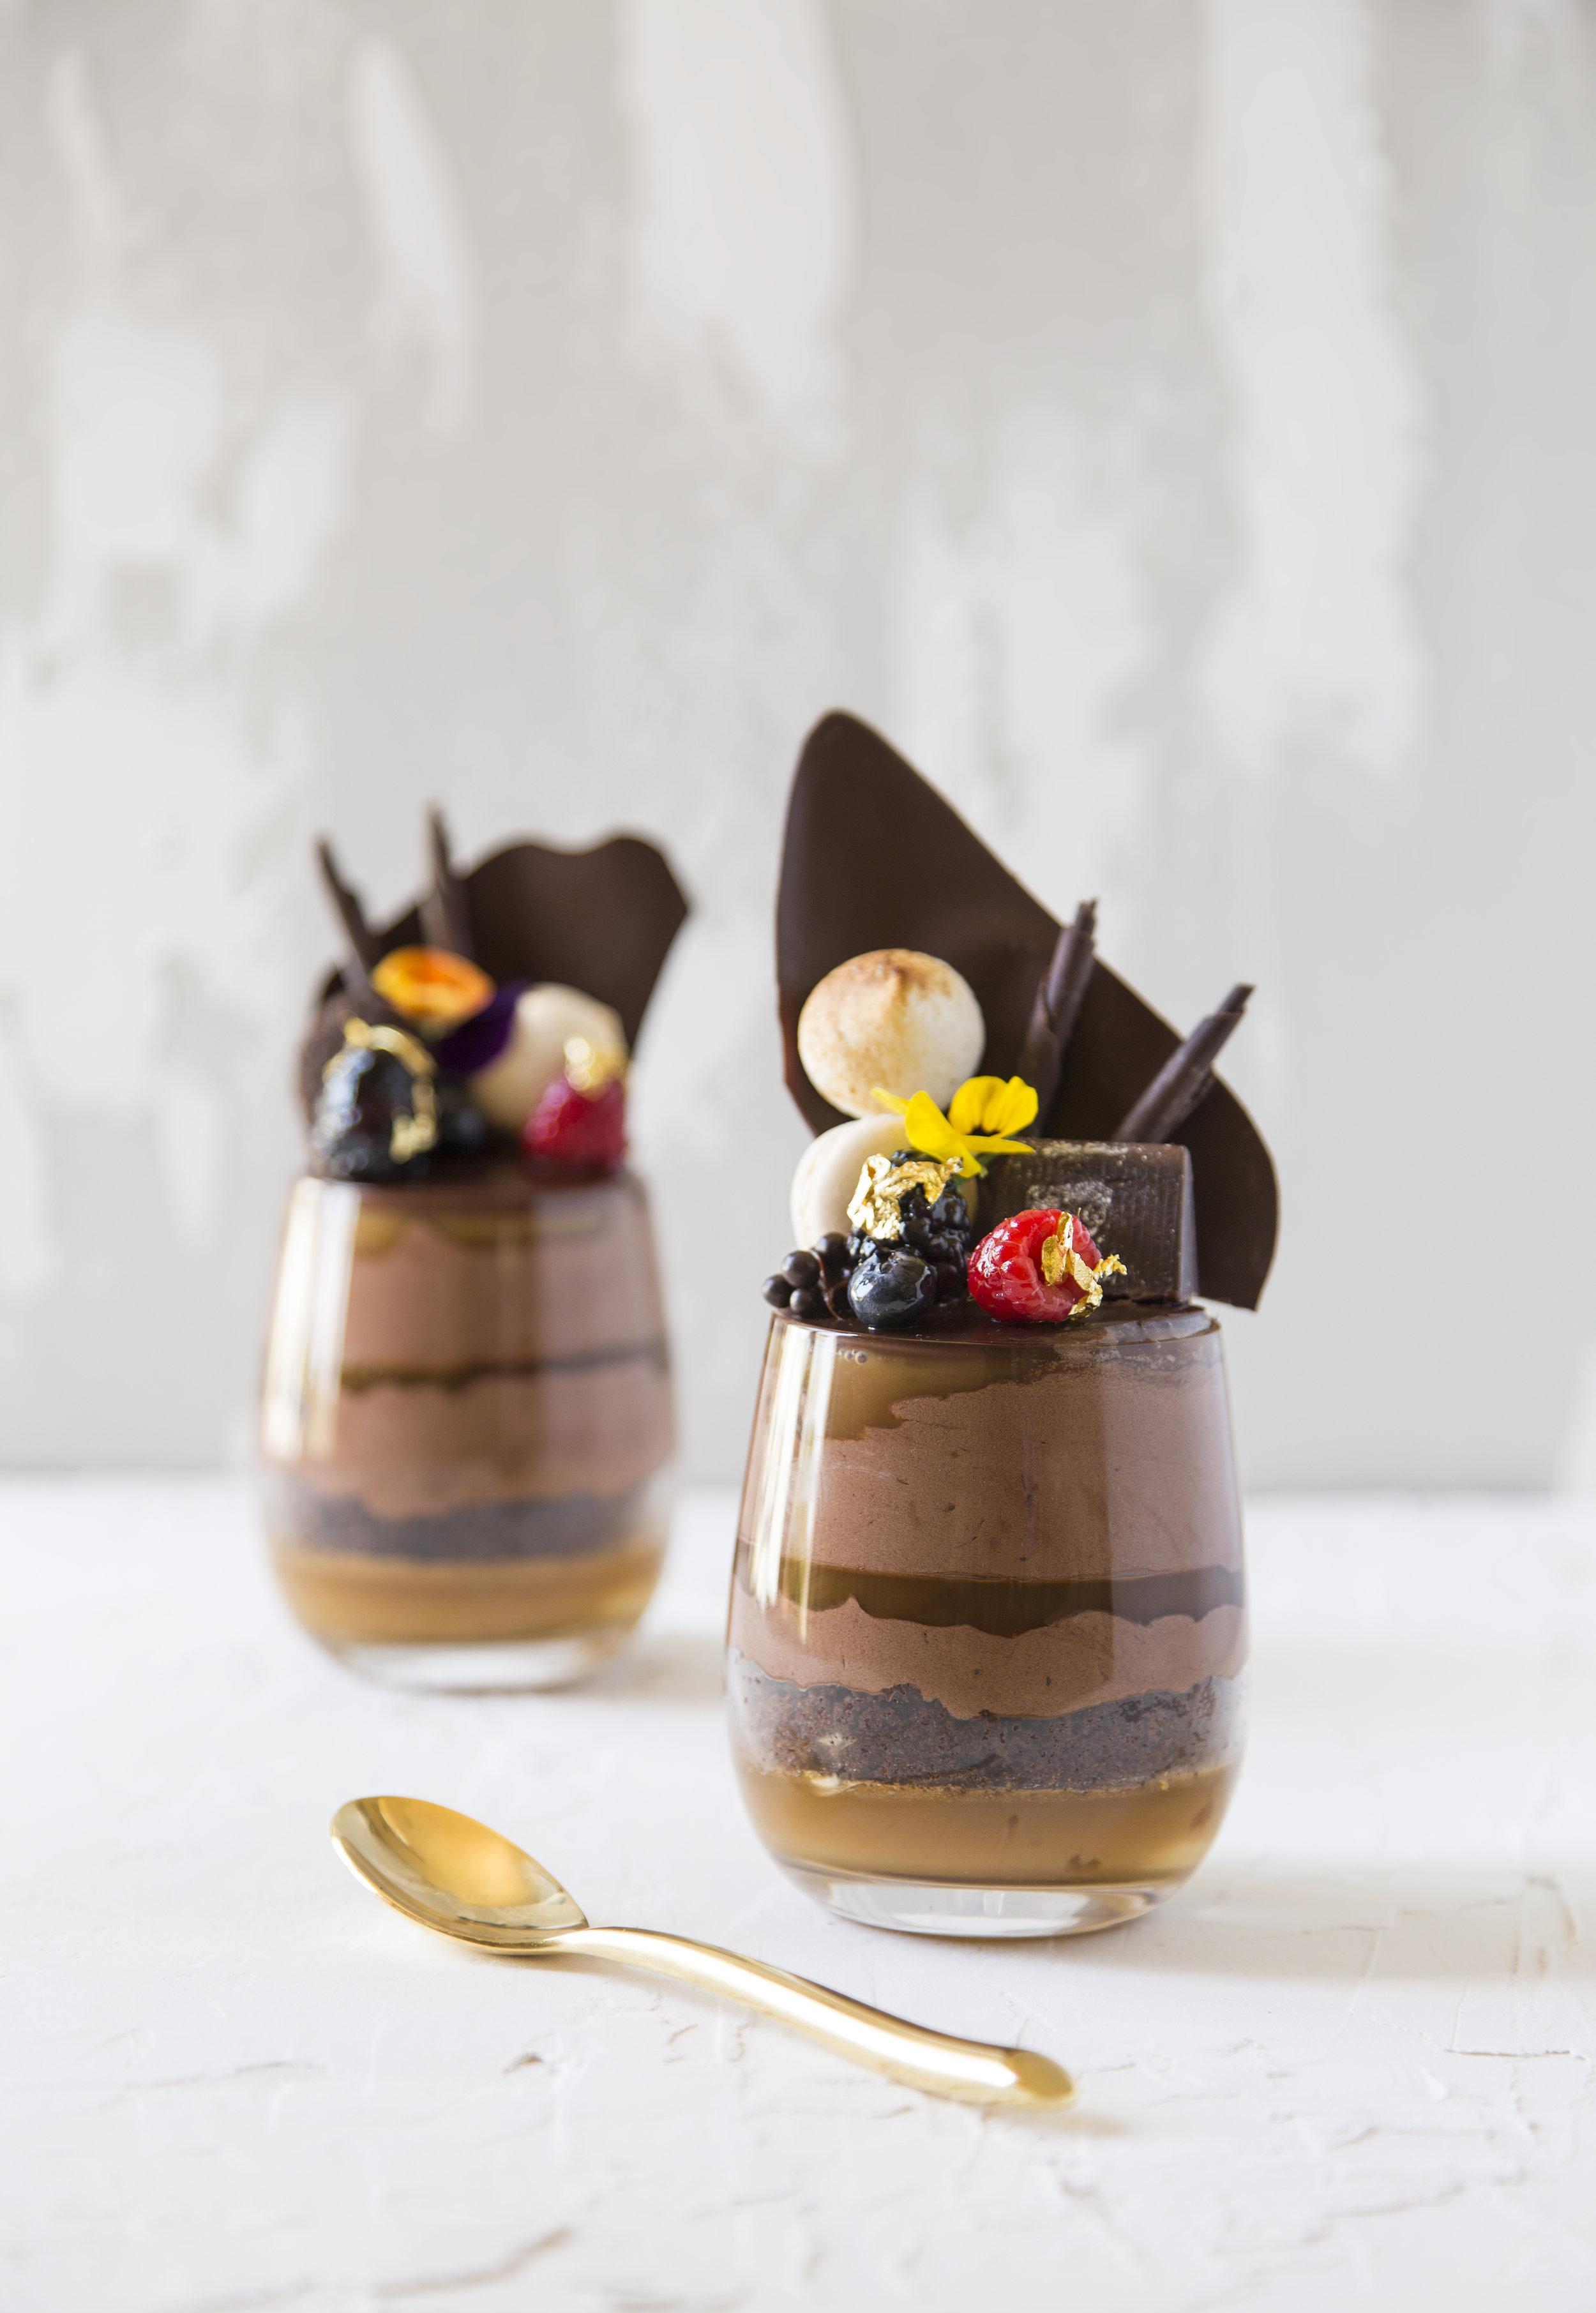 Food Stylist Parfait Dessert.jpg